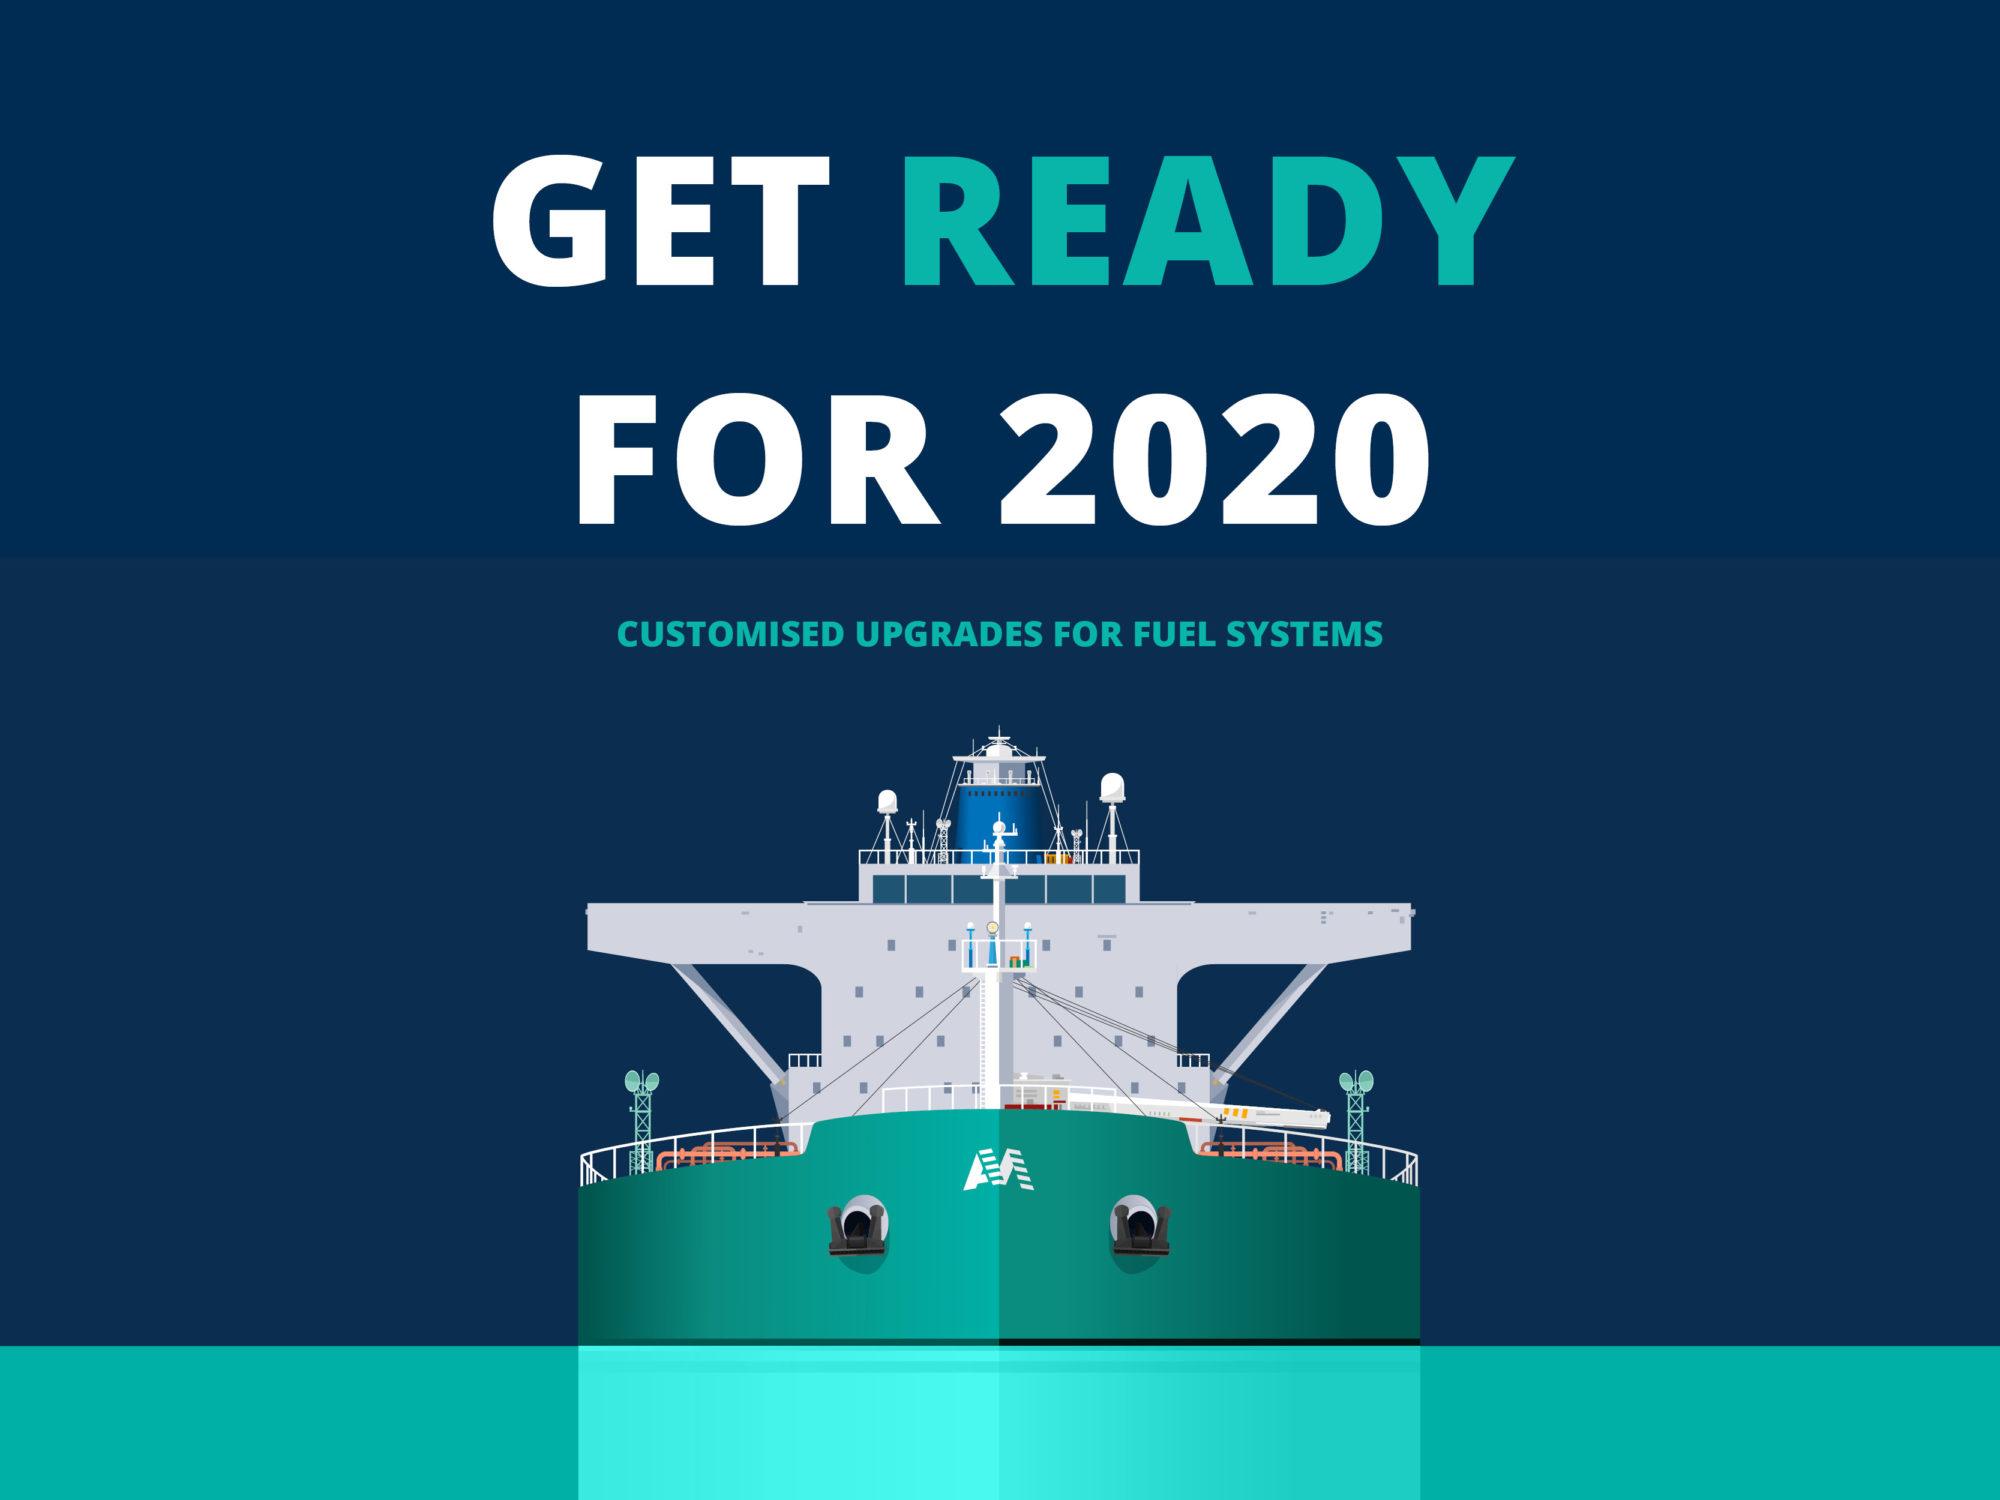 FUEL SYSTEM UPGRADE 2020